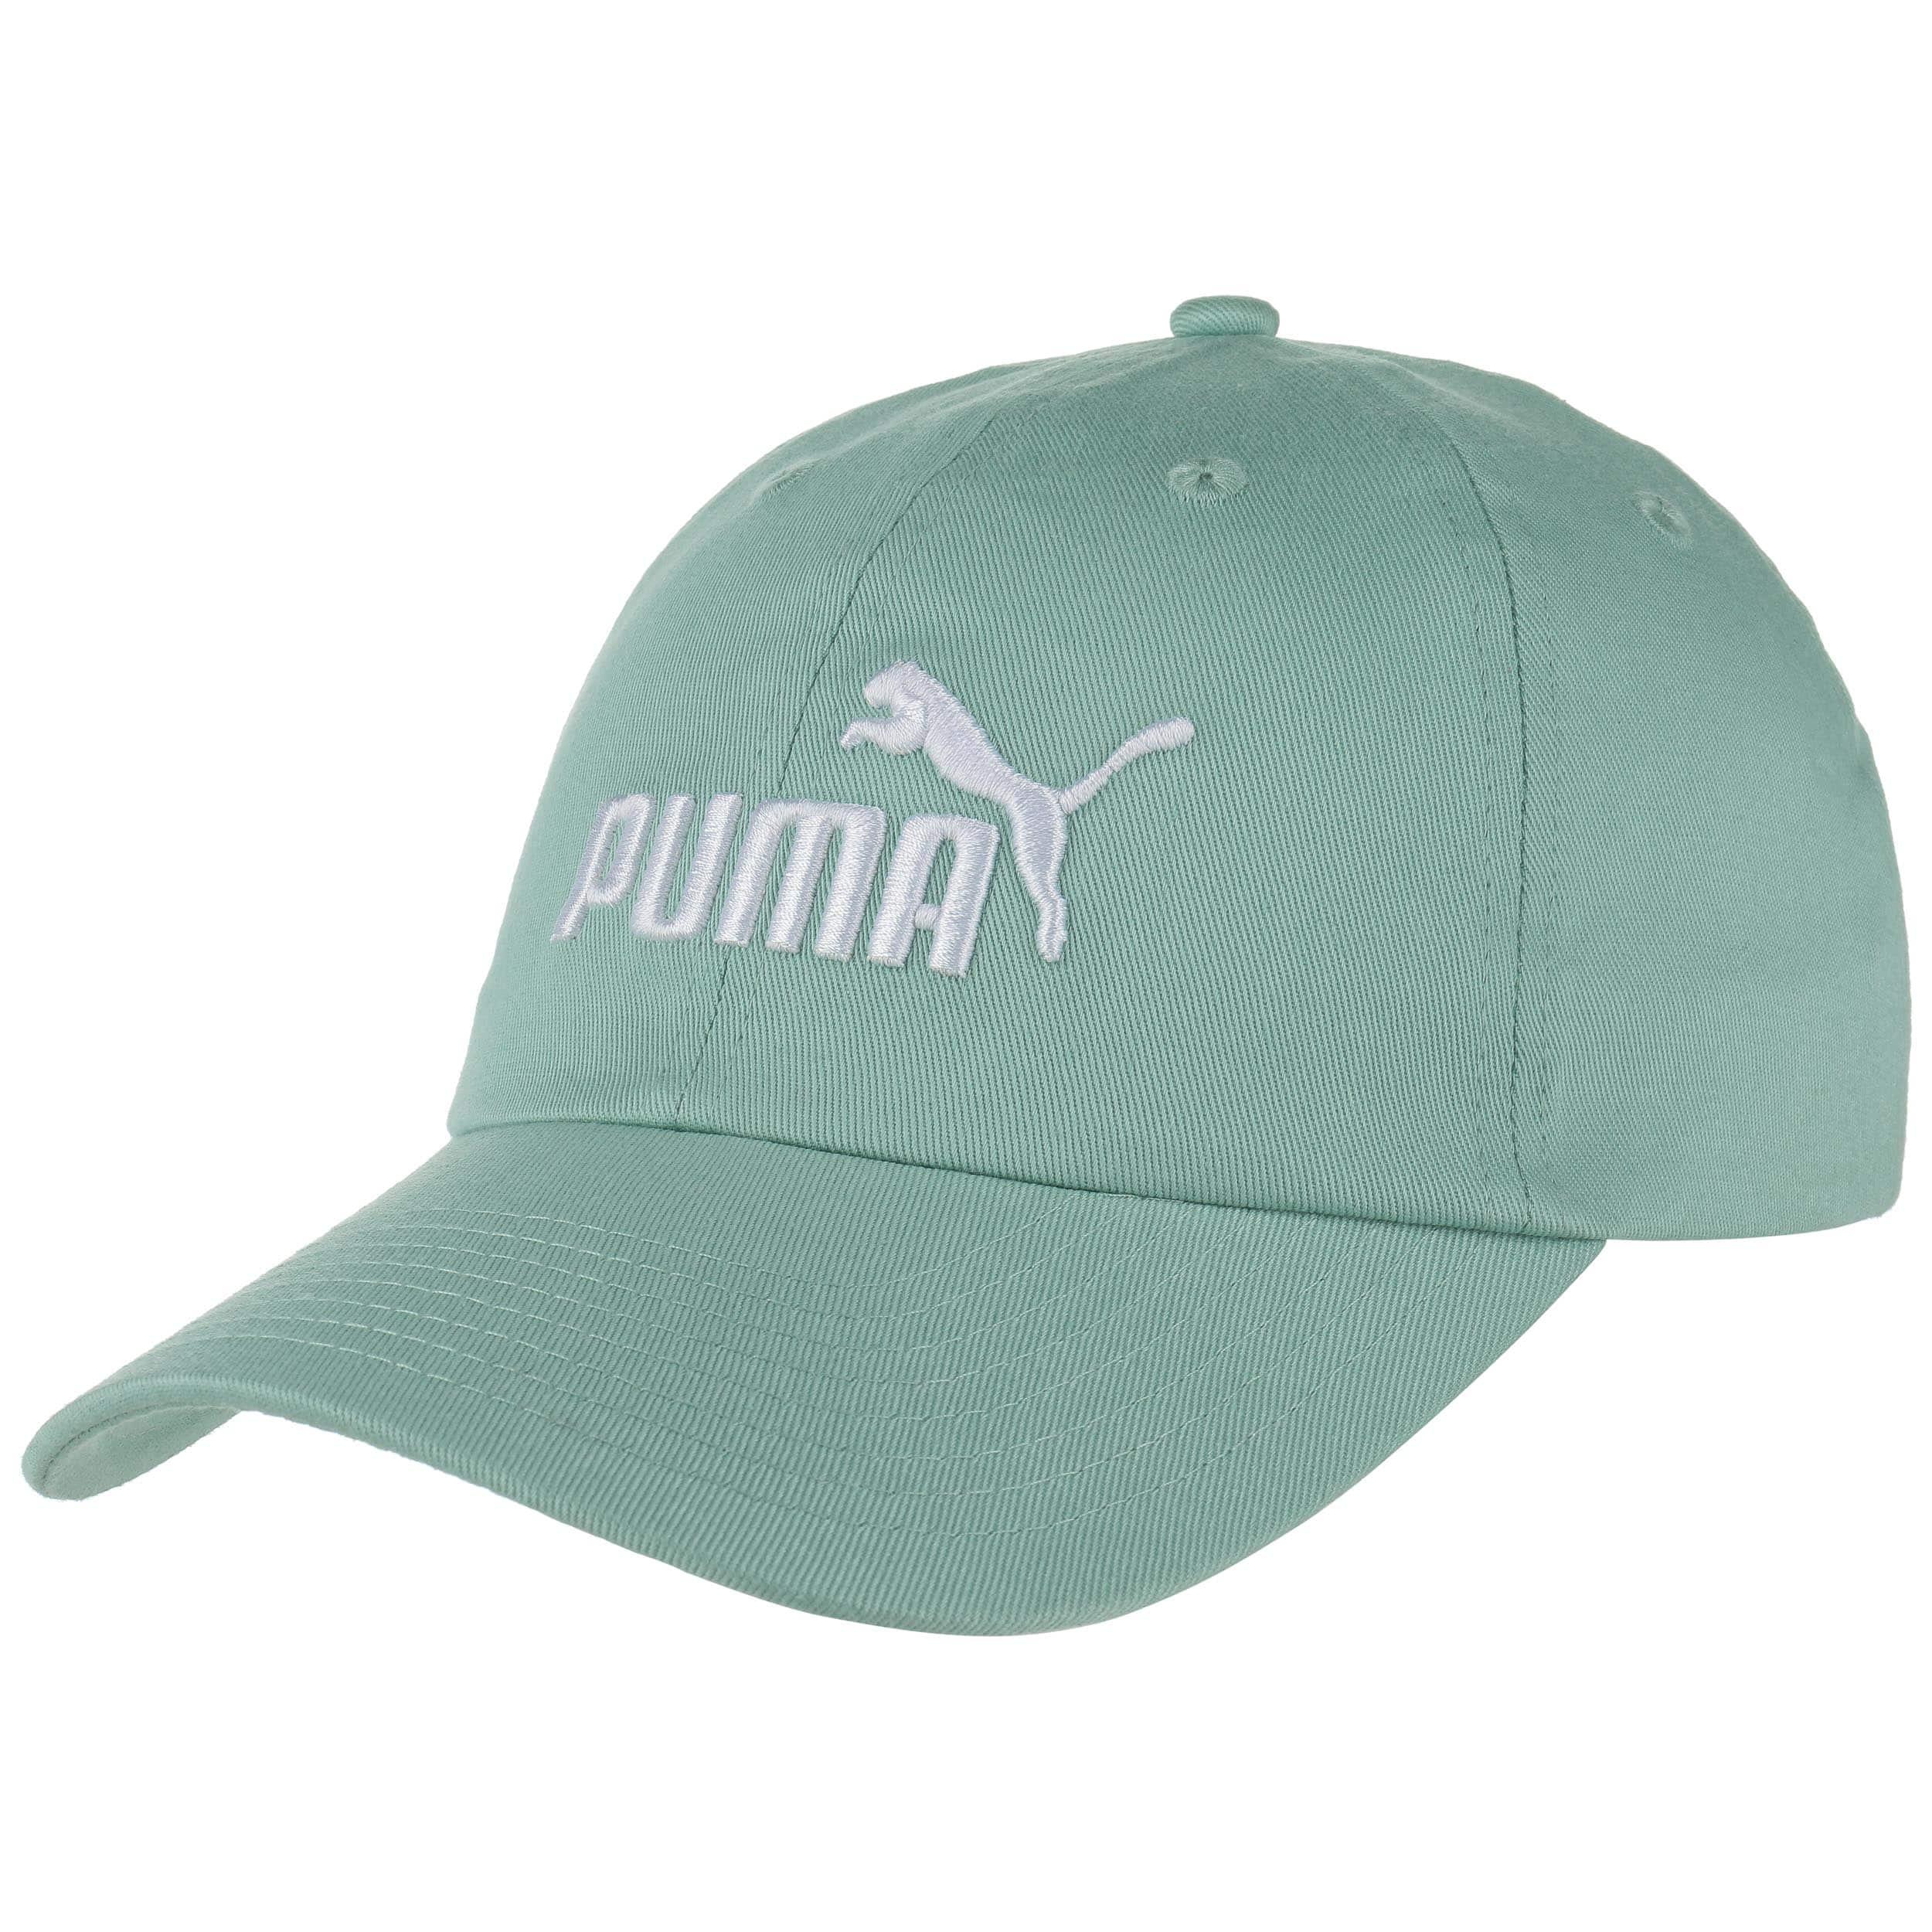 a3f6e2b397d5 1 Baseball Cap by PUMA - mint green 5